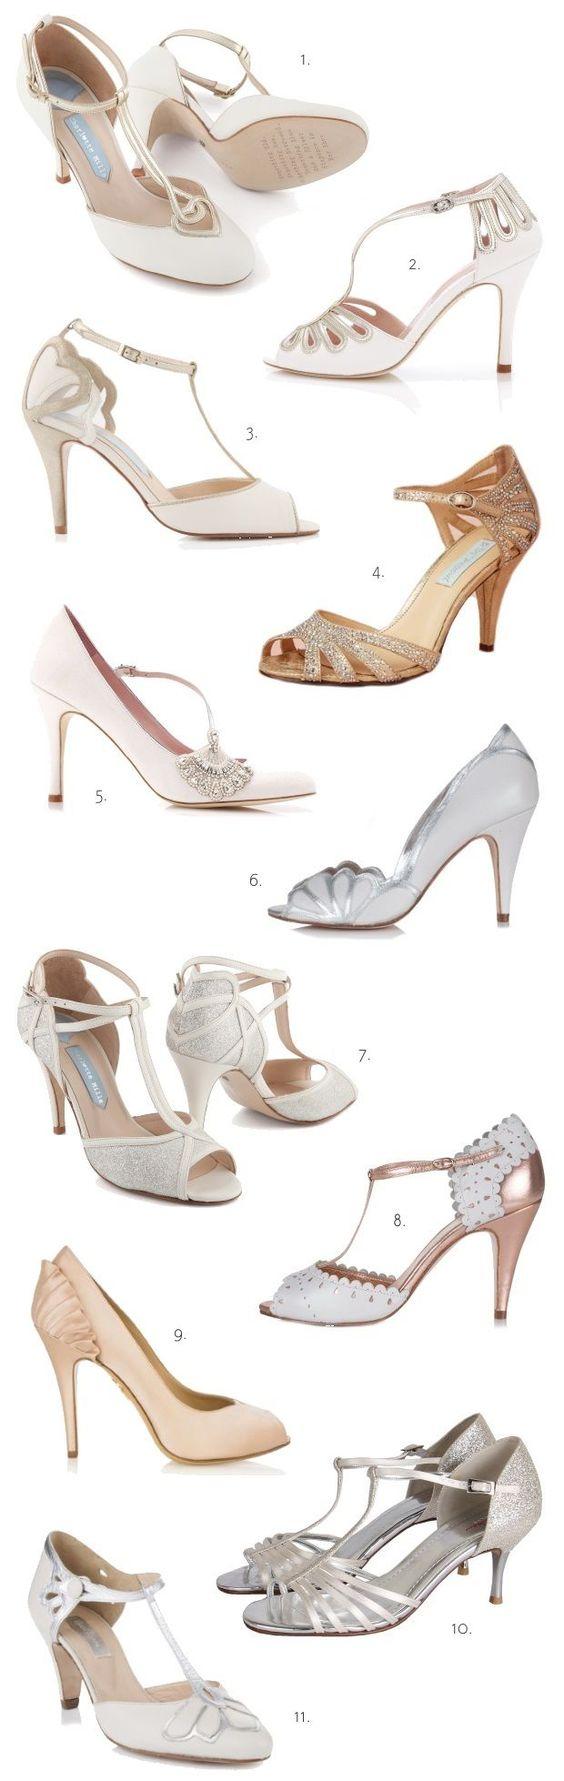 Vintage wedding heels TDF!